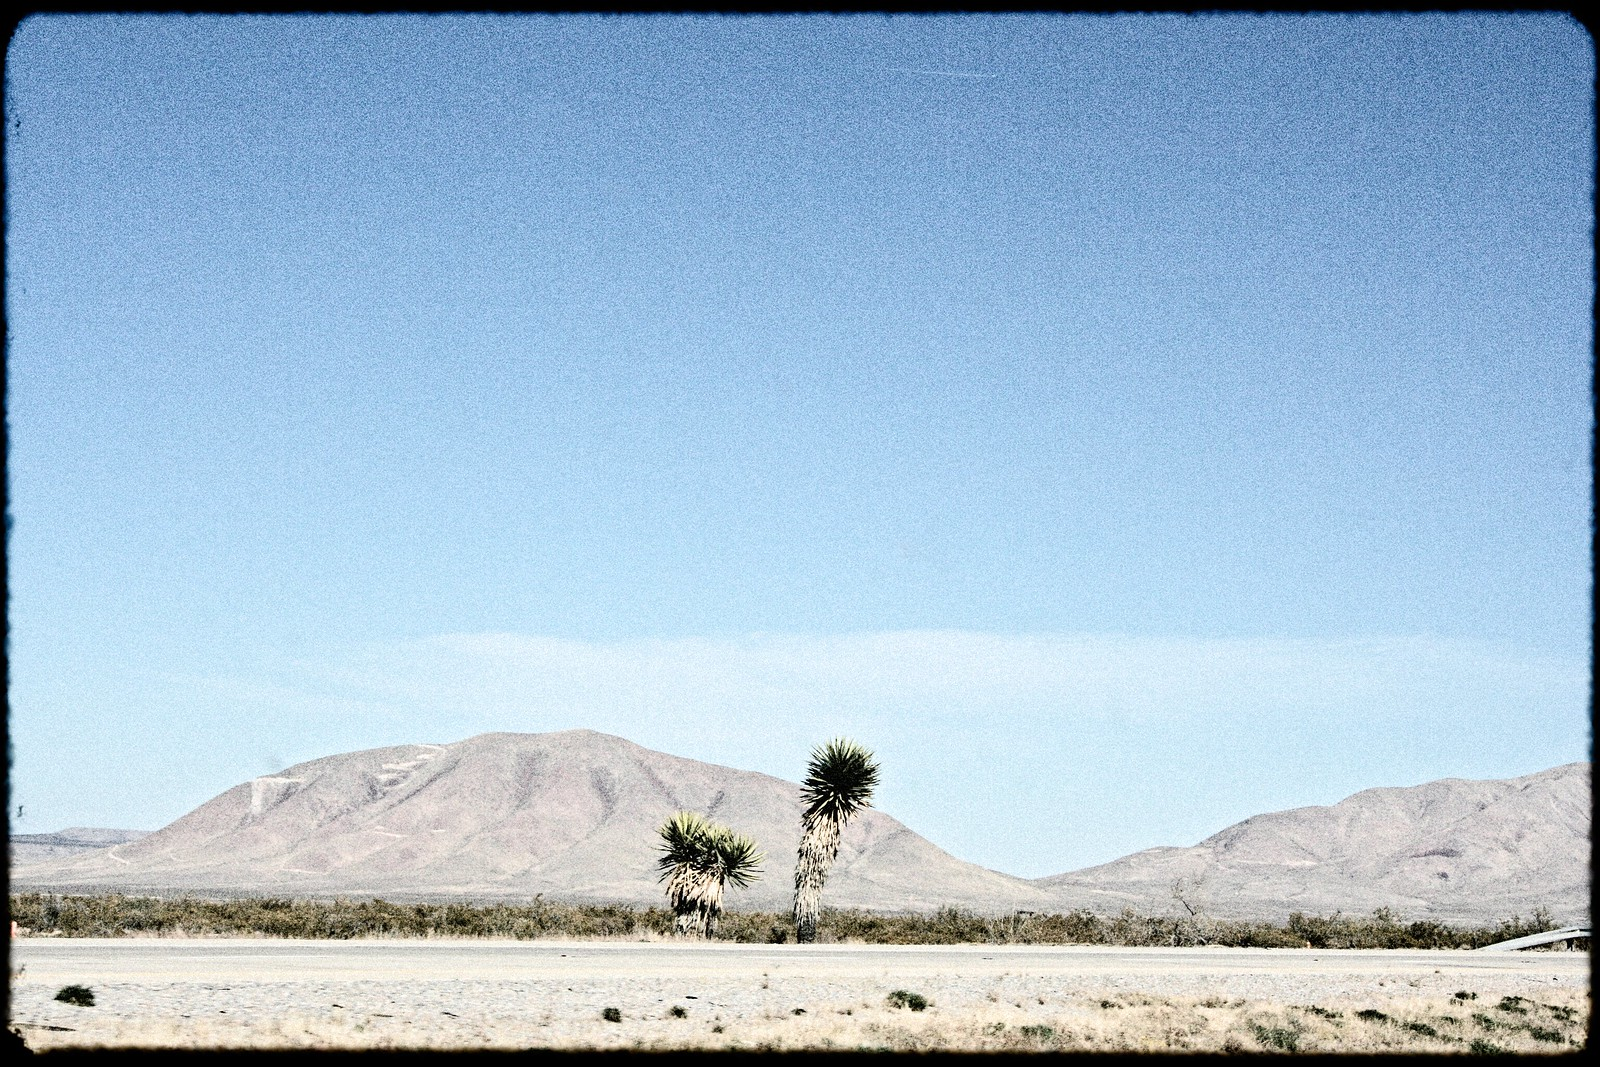 Roadside Palms, West Texas, 2006